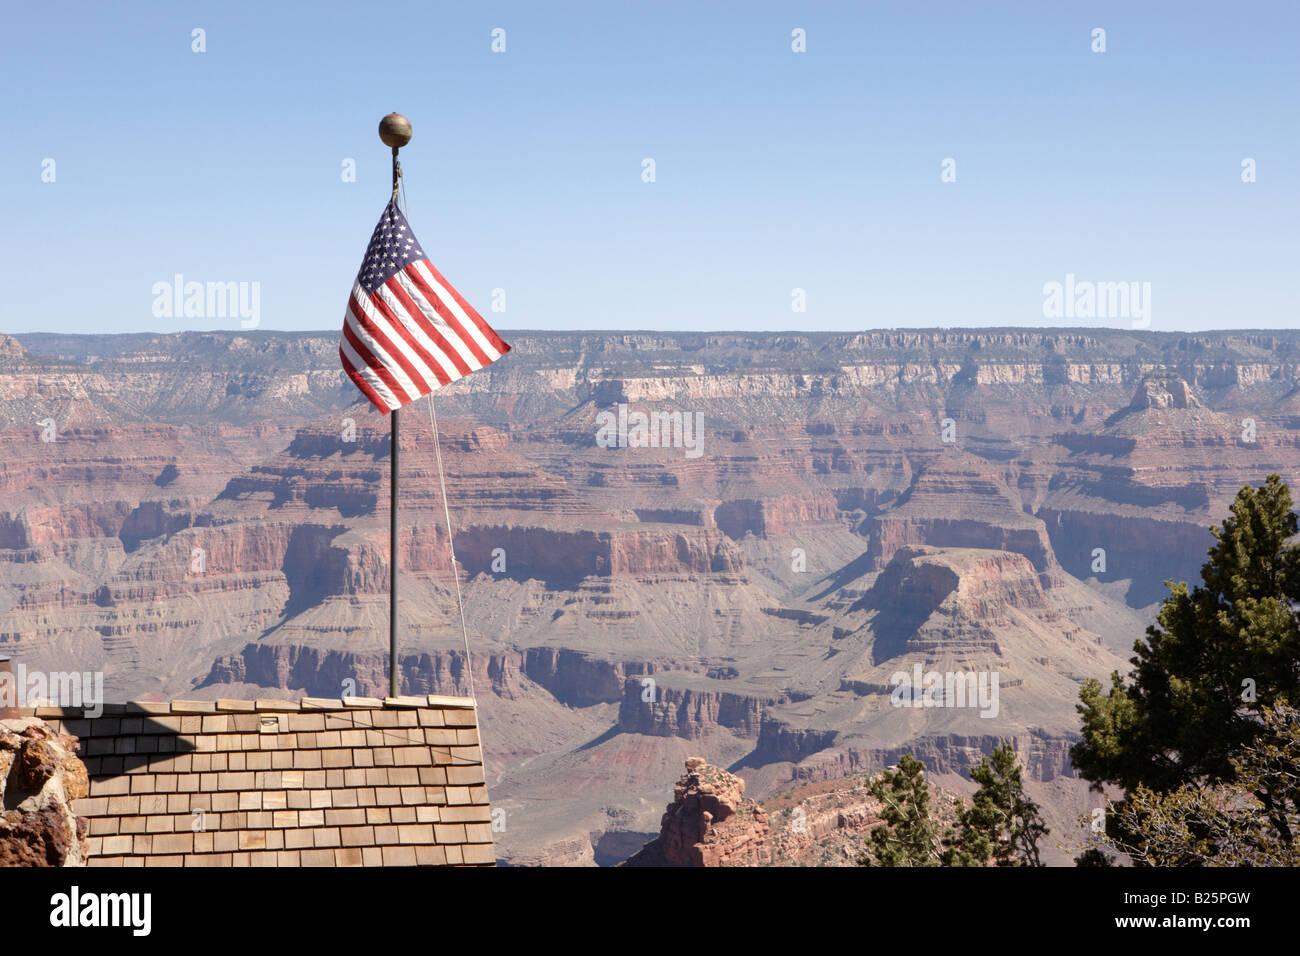 USA Flag at Grand Canyon Village in Arizona USA - Stock Image